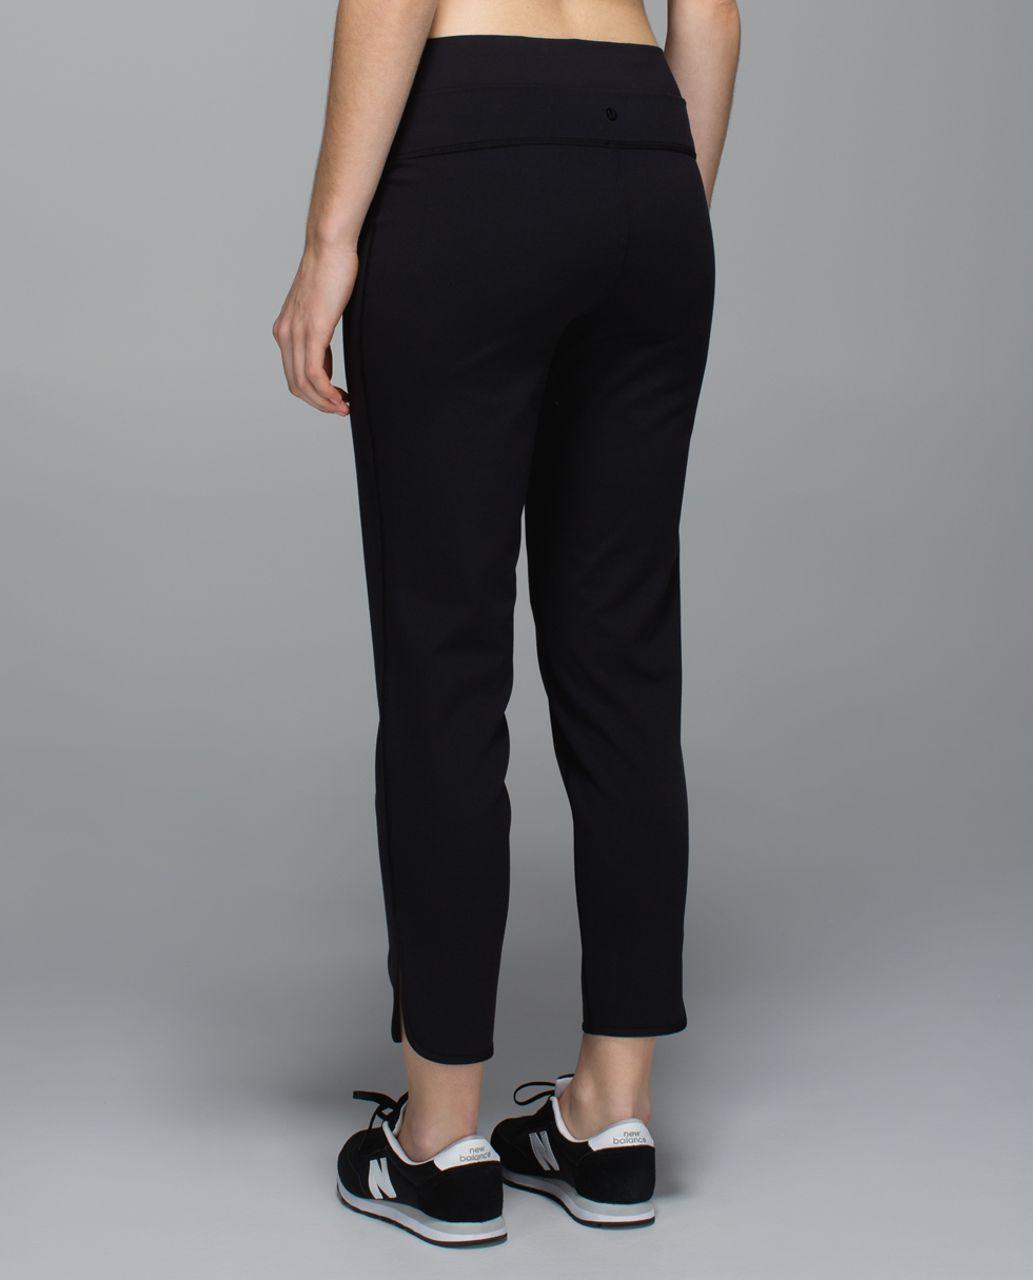 Lululemon Straight To Class Pant *Full-On-Luon - Black